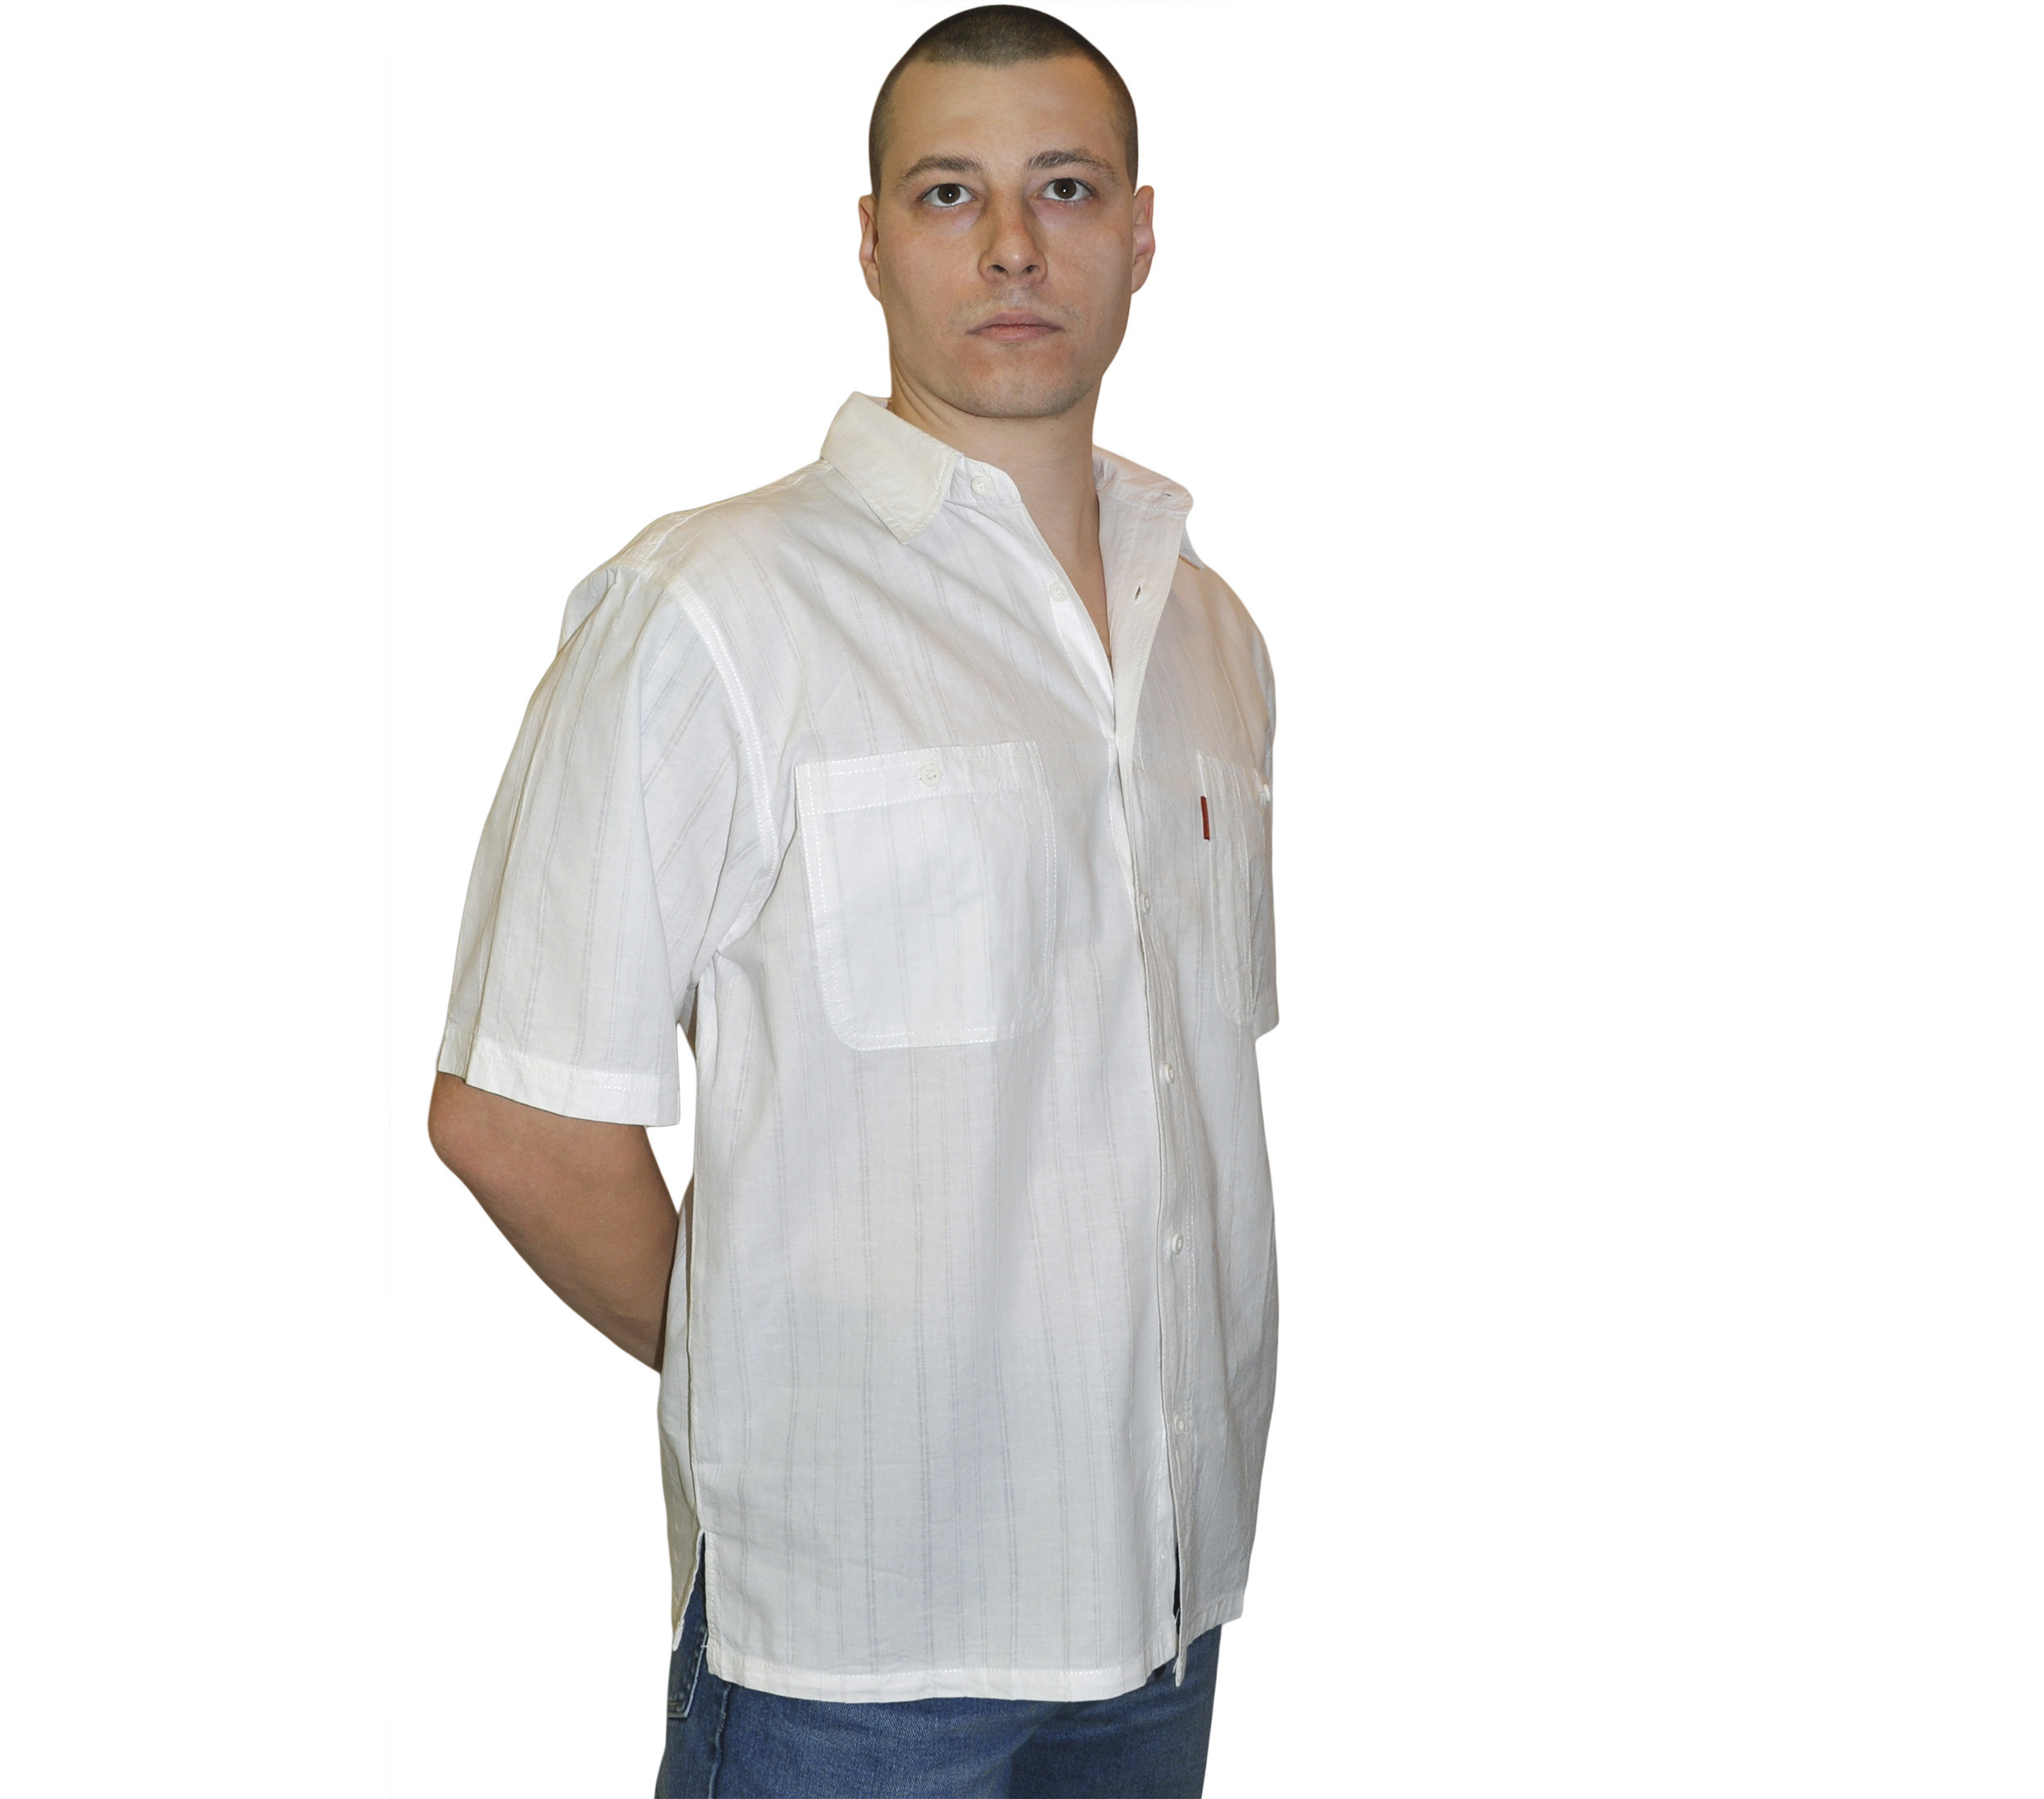 Рубашка с коротким рукавом белого цвета с прострочками. Размер